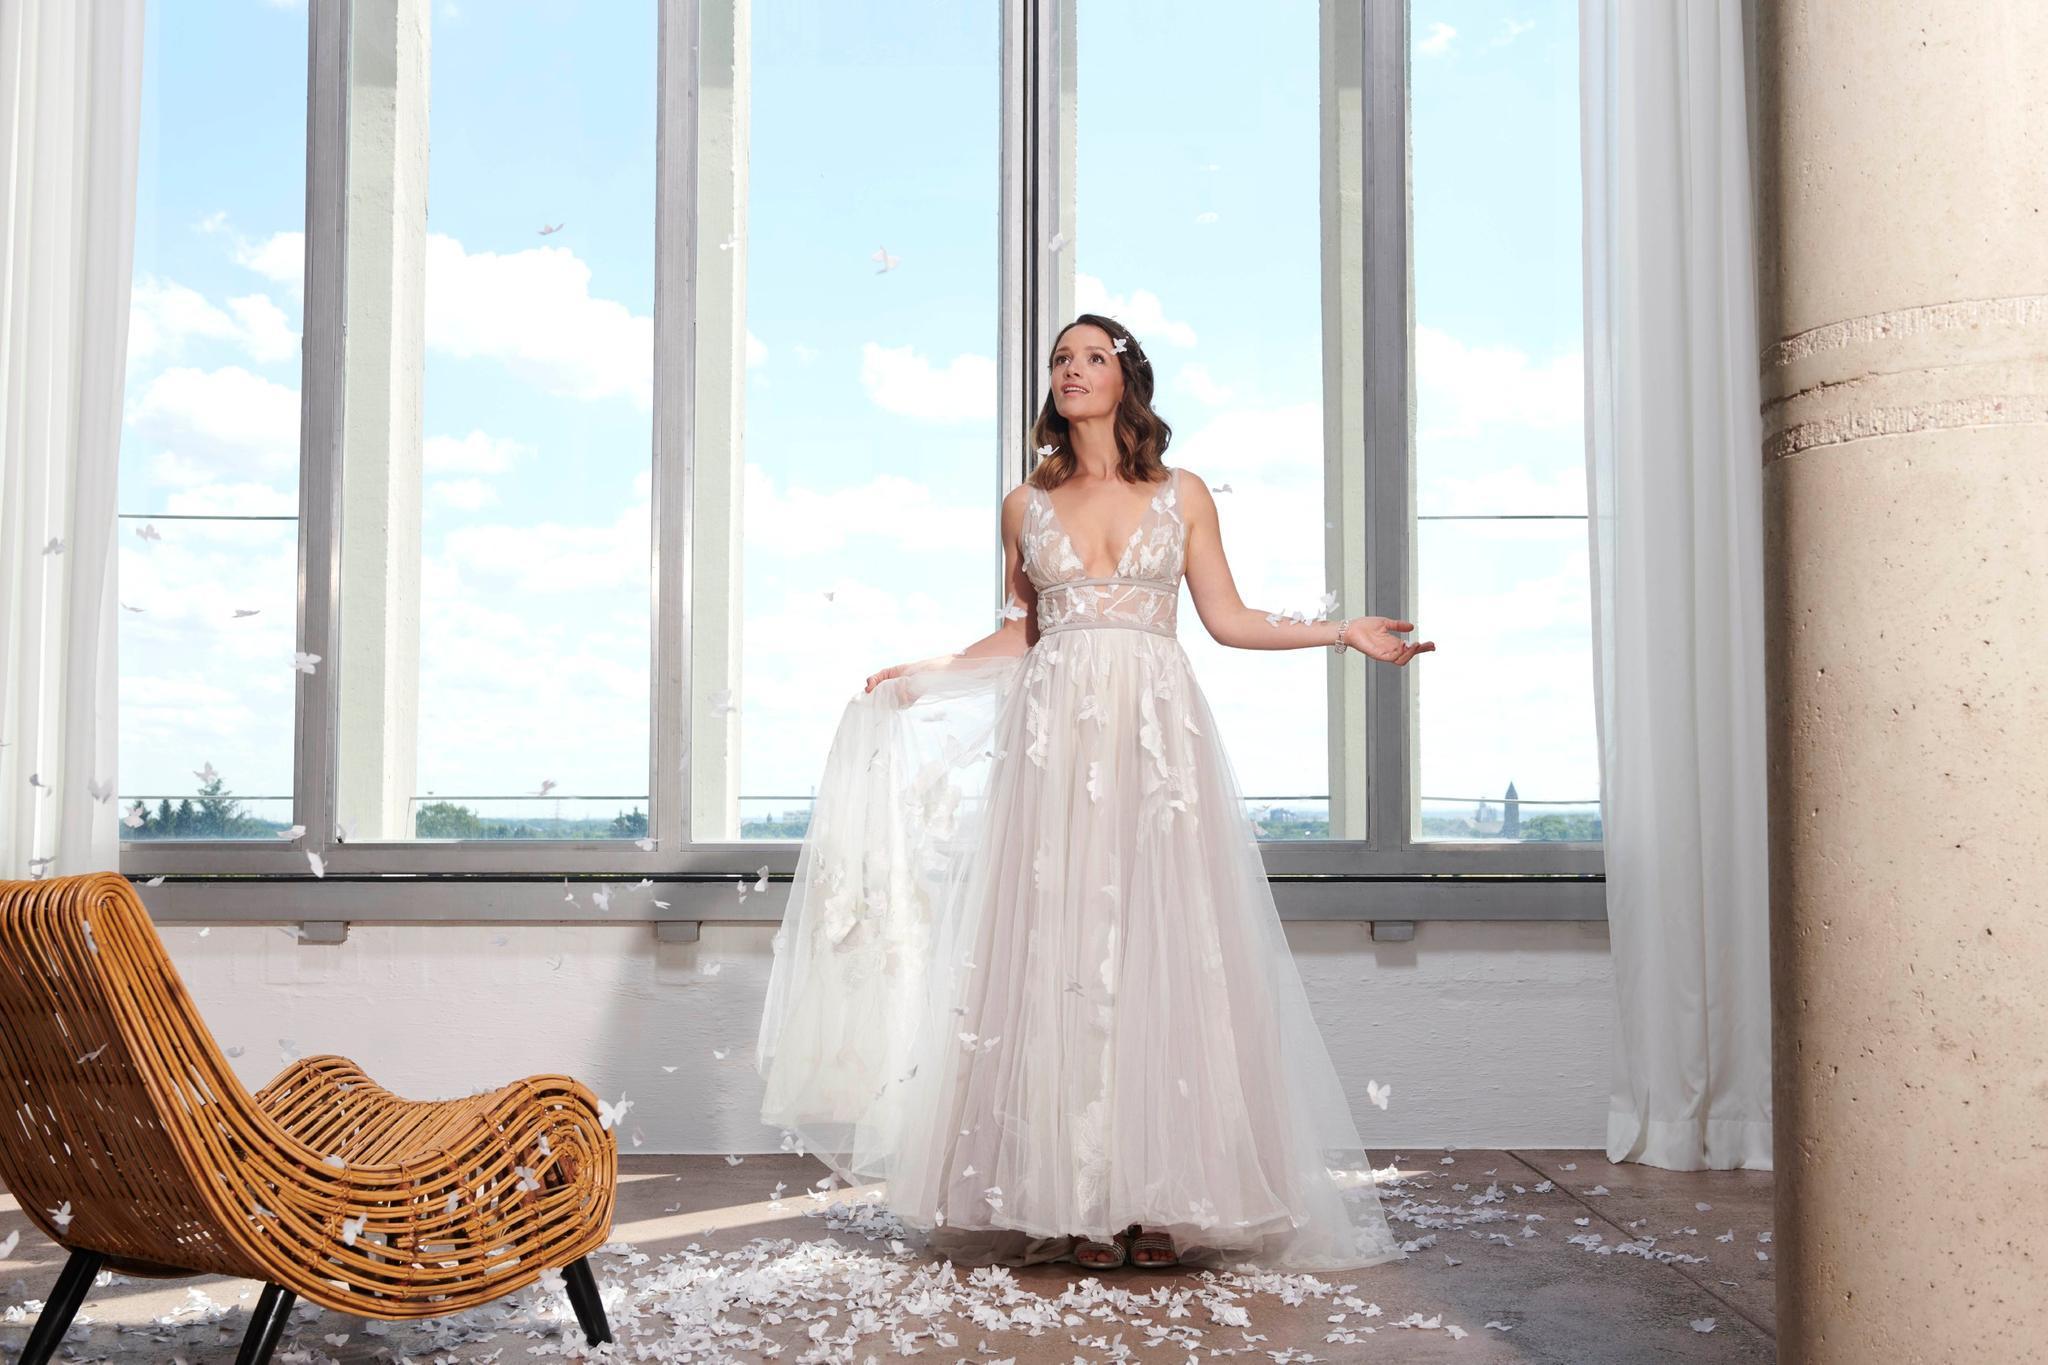 Alles Was Zählt: Jenny Steinkamp trägt freizügiges Brautkleid | GALA.de